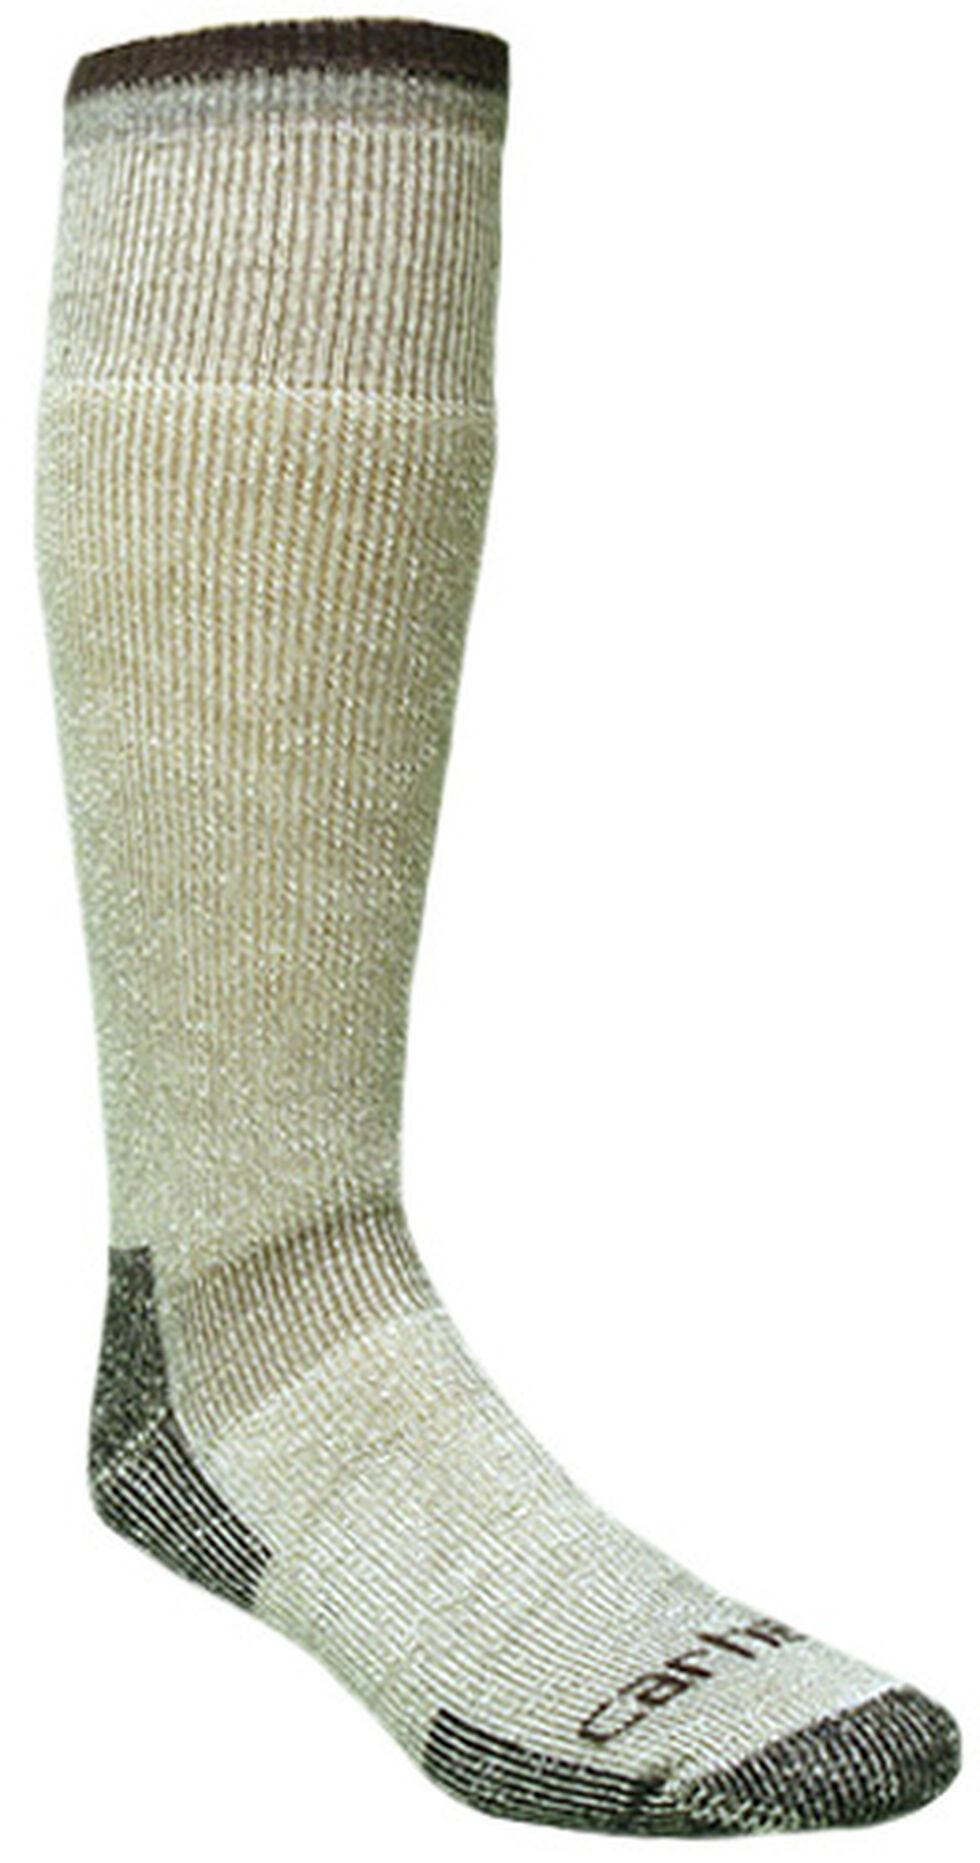 Carhartt Arctic Wool Heavyweight Boot Socks, Moss, hi-res